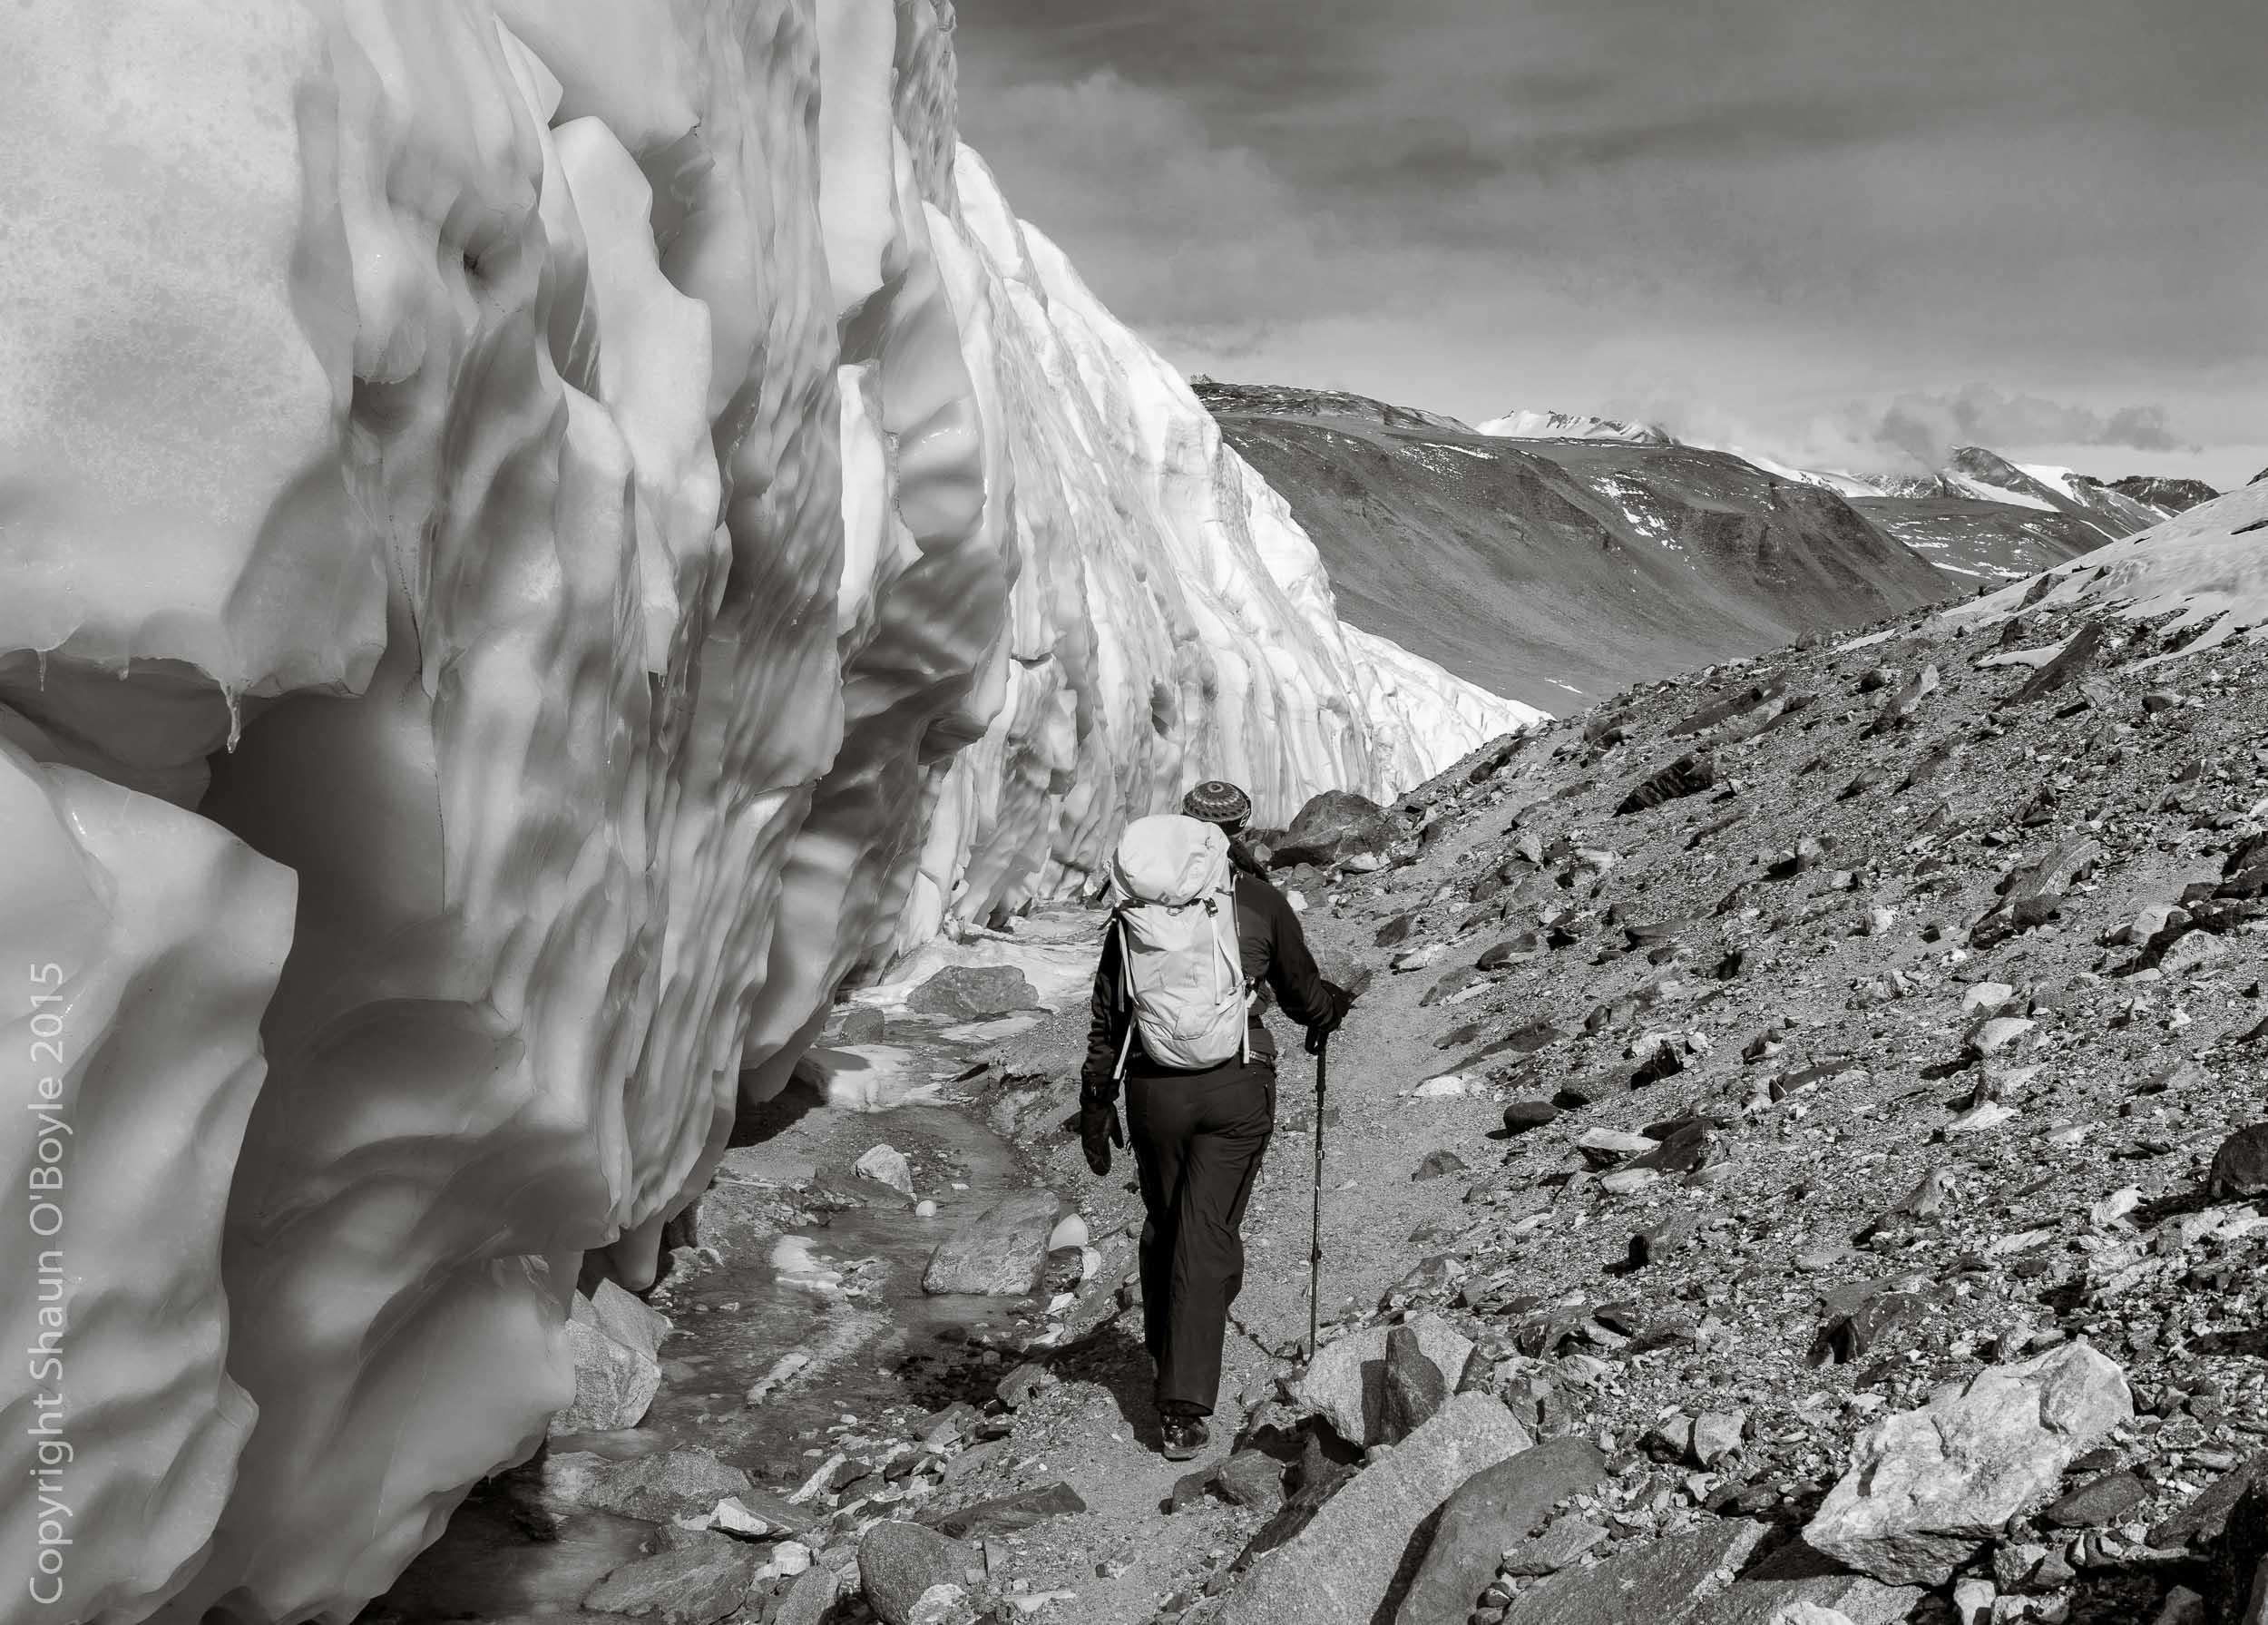 Renee trekking along side of the Canada Glacier